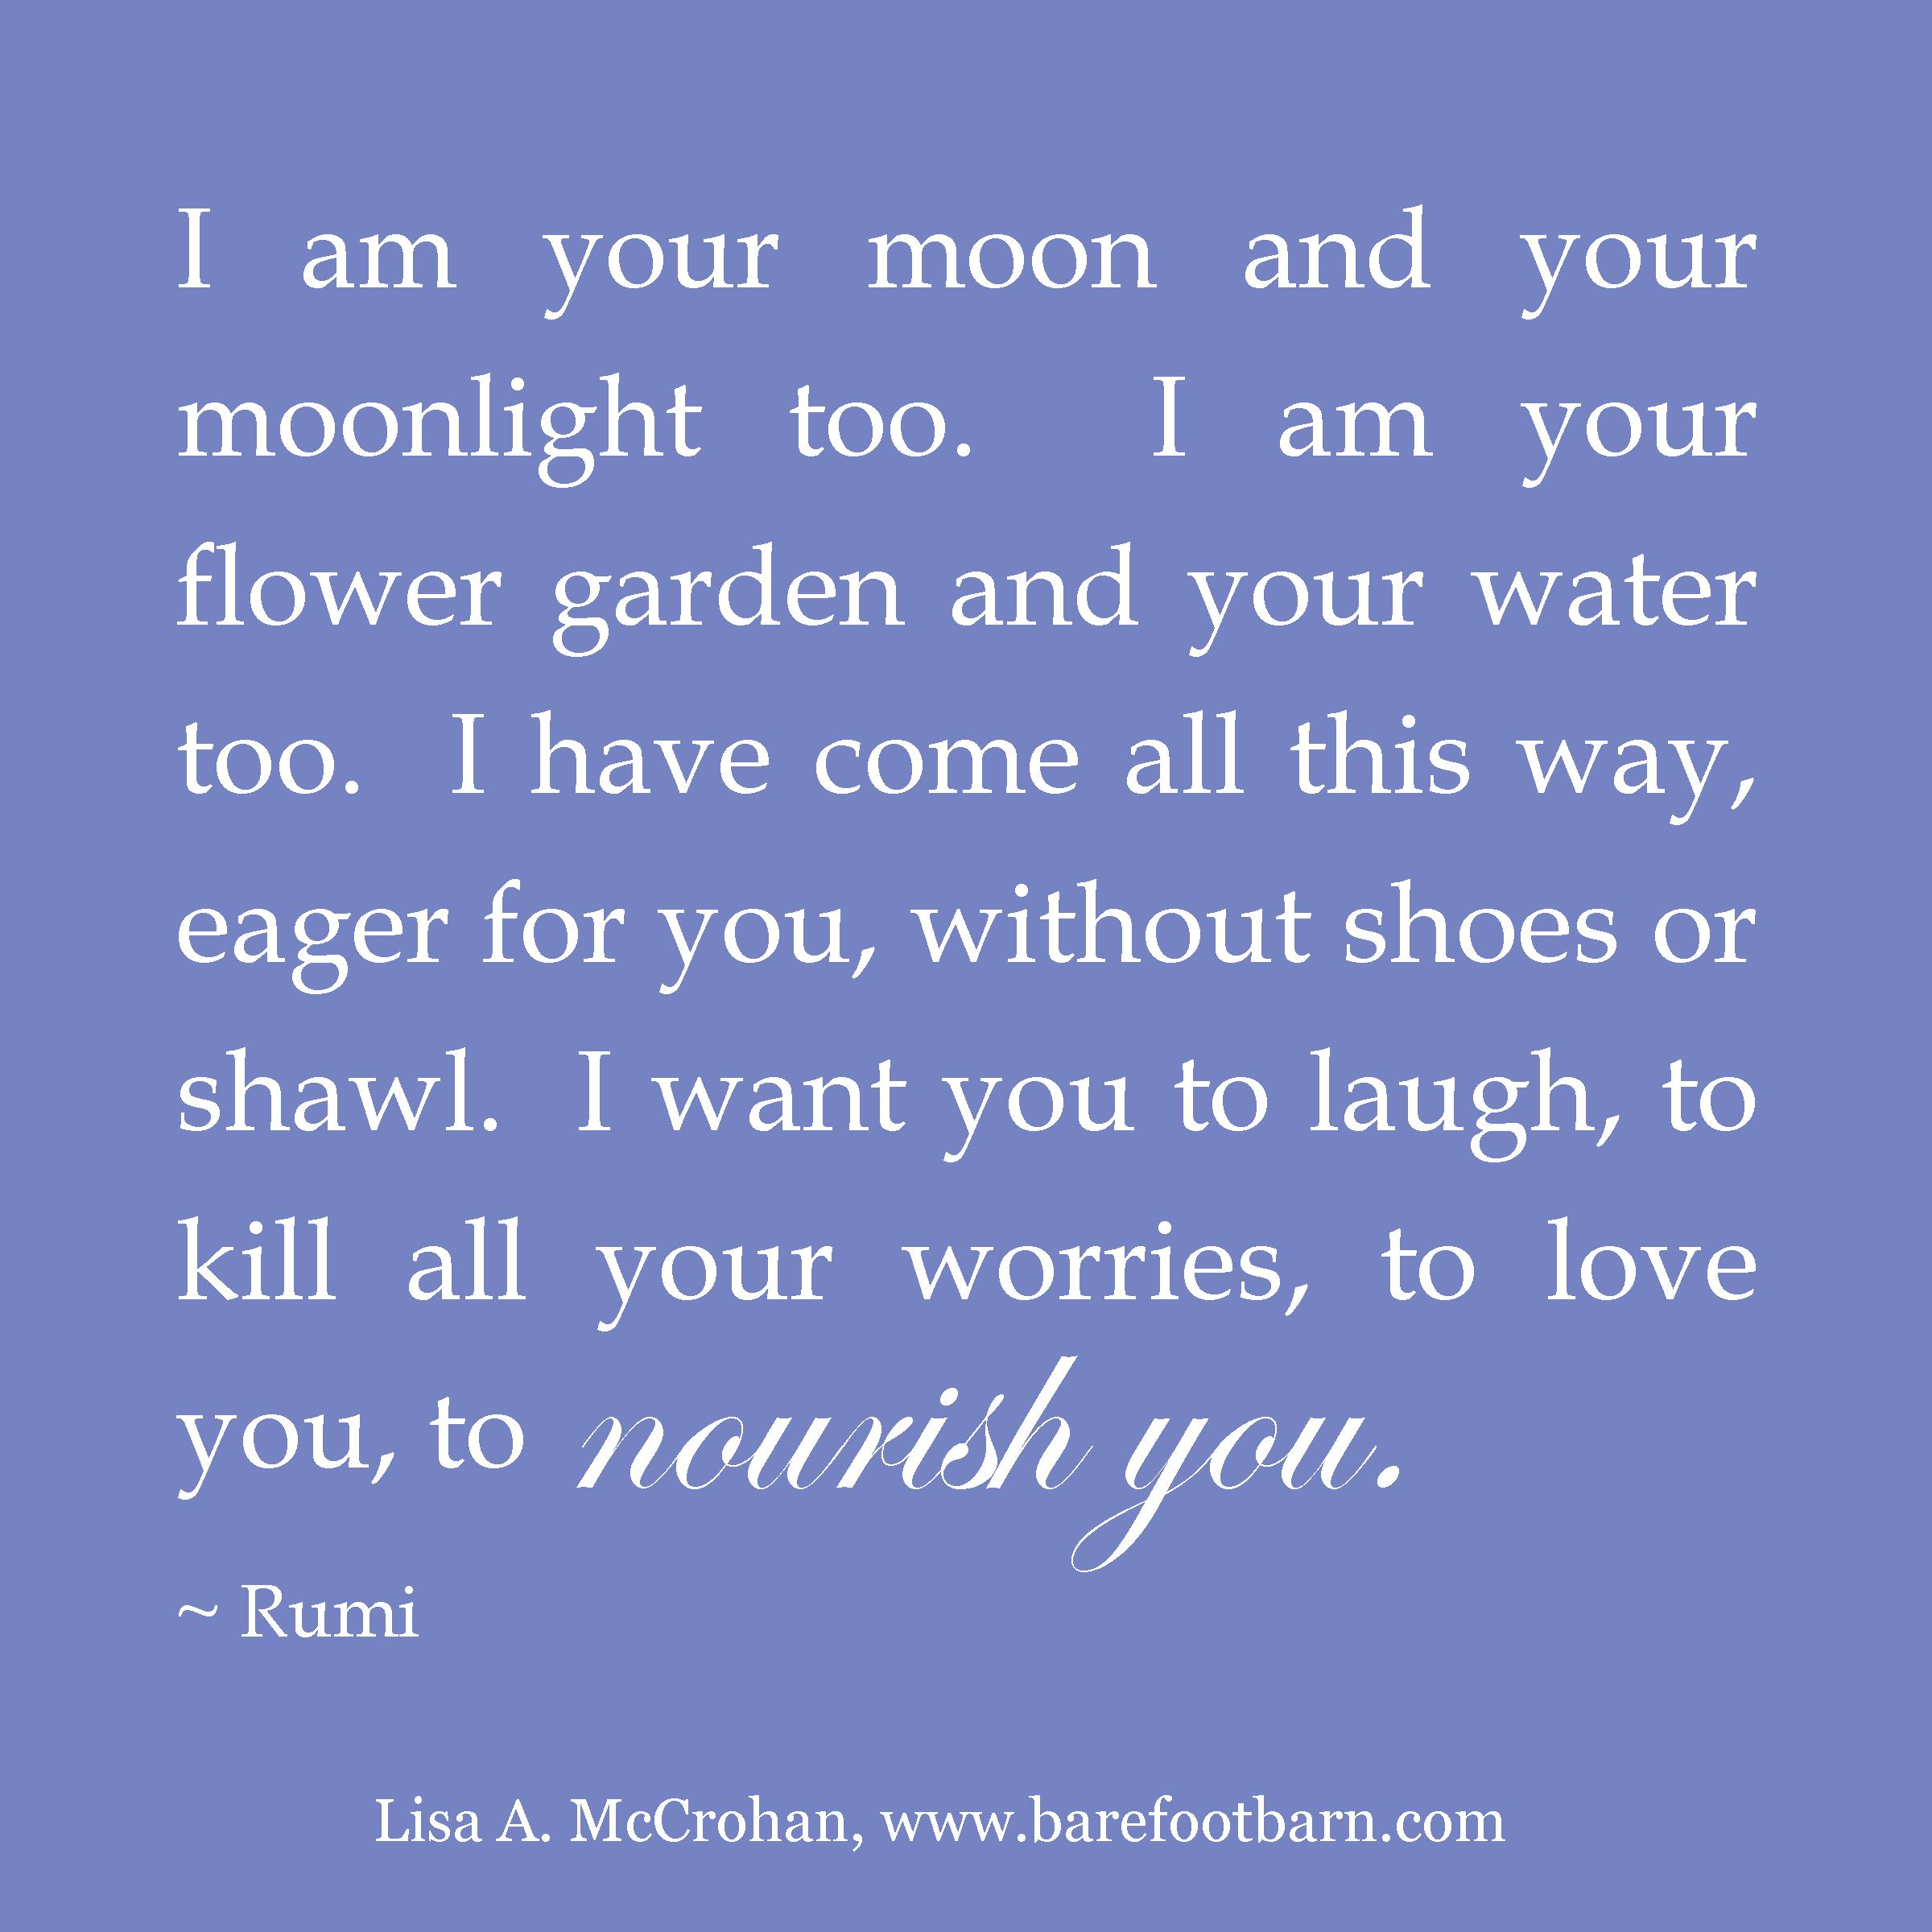 Rumi Quotes On Life Rumi Moonlight 8 X 8 High Resolution  Lisa Mccrohan